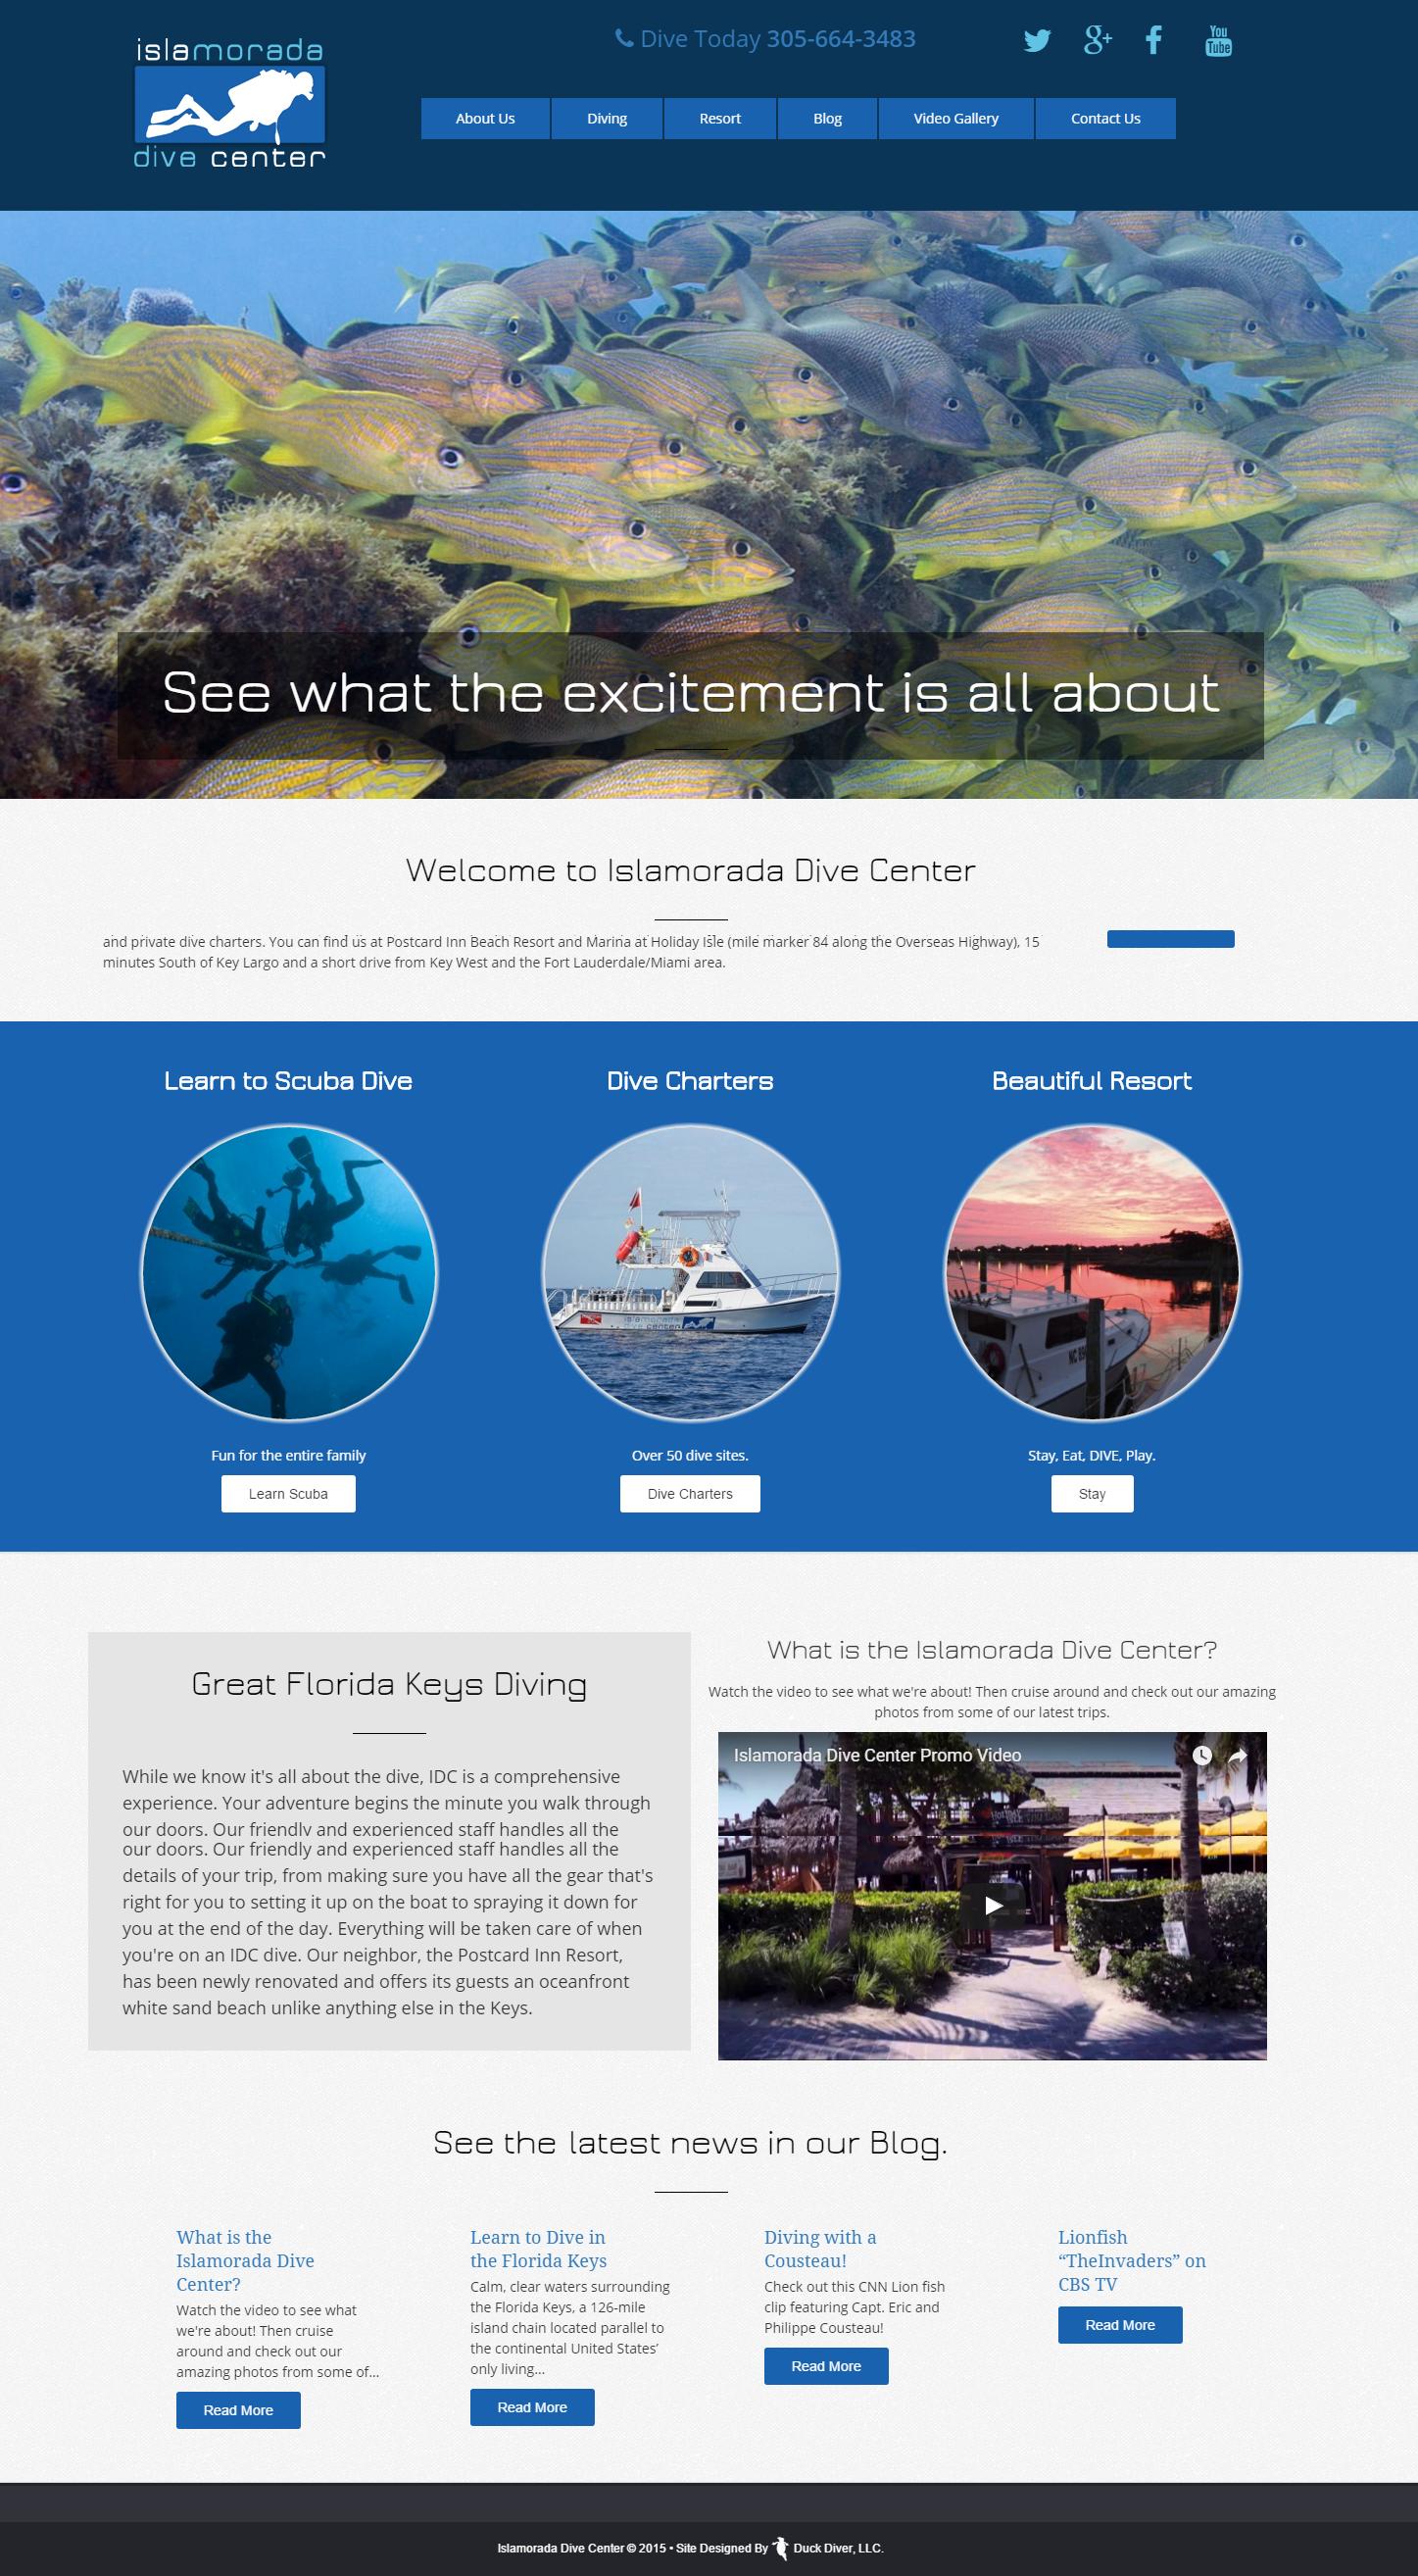 Islamorada Dive Center